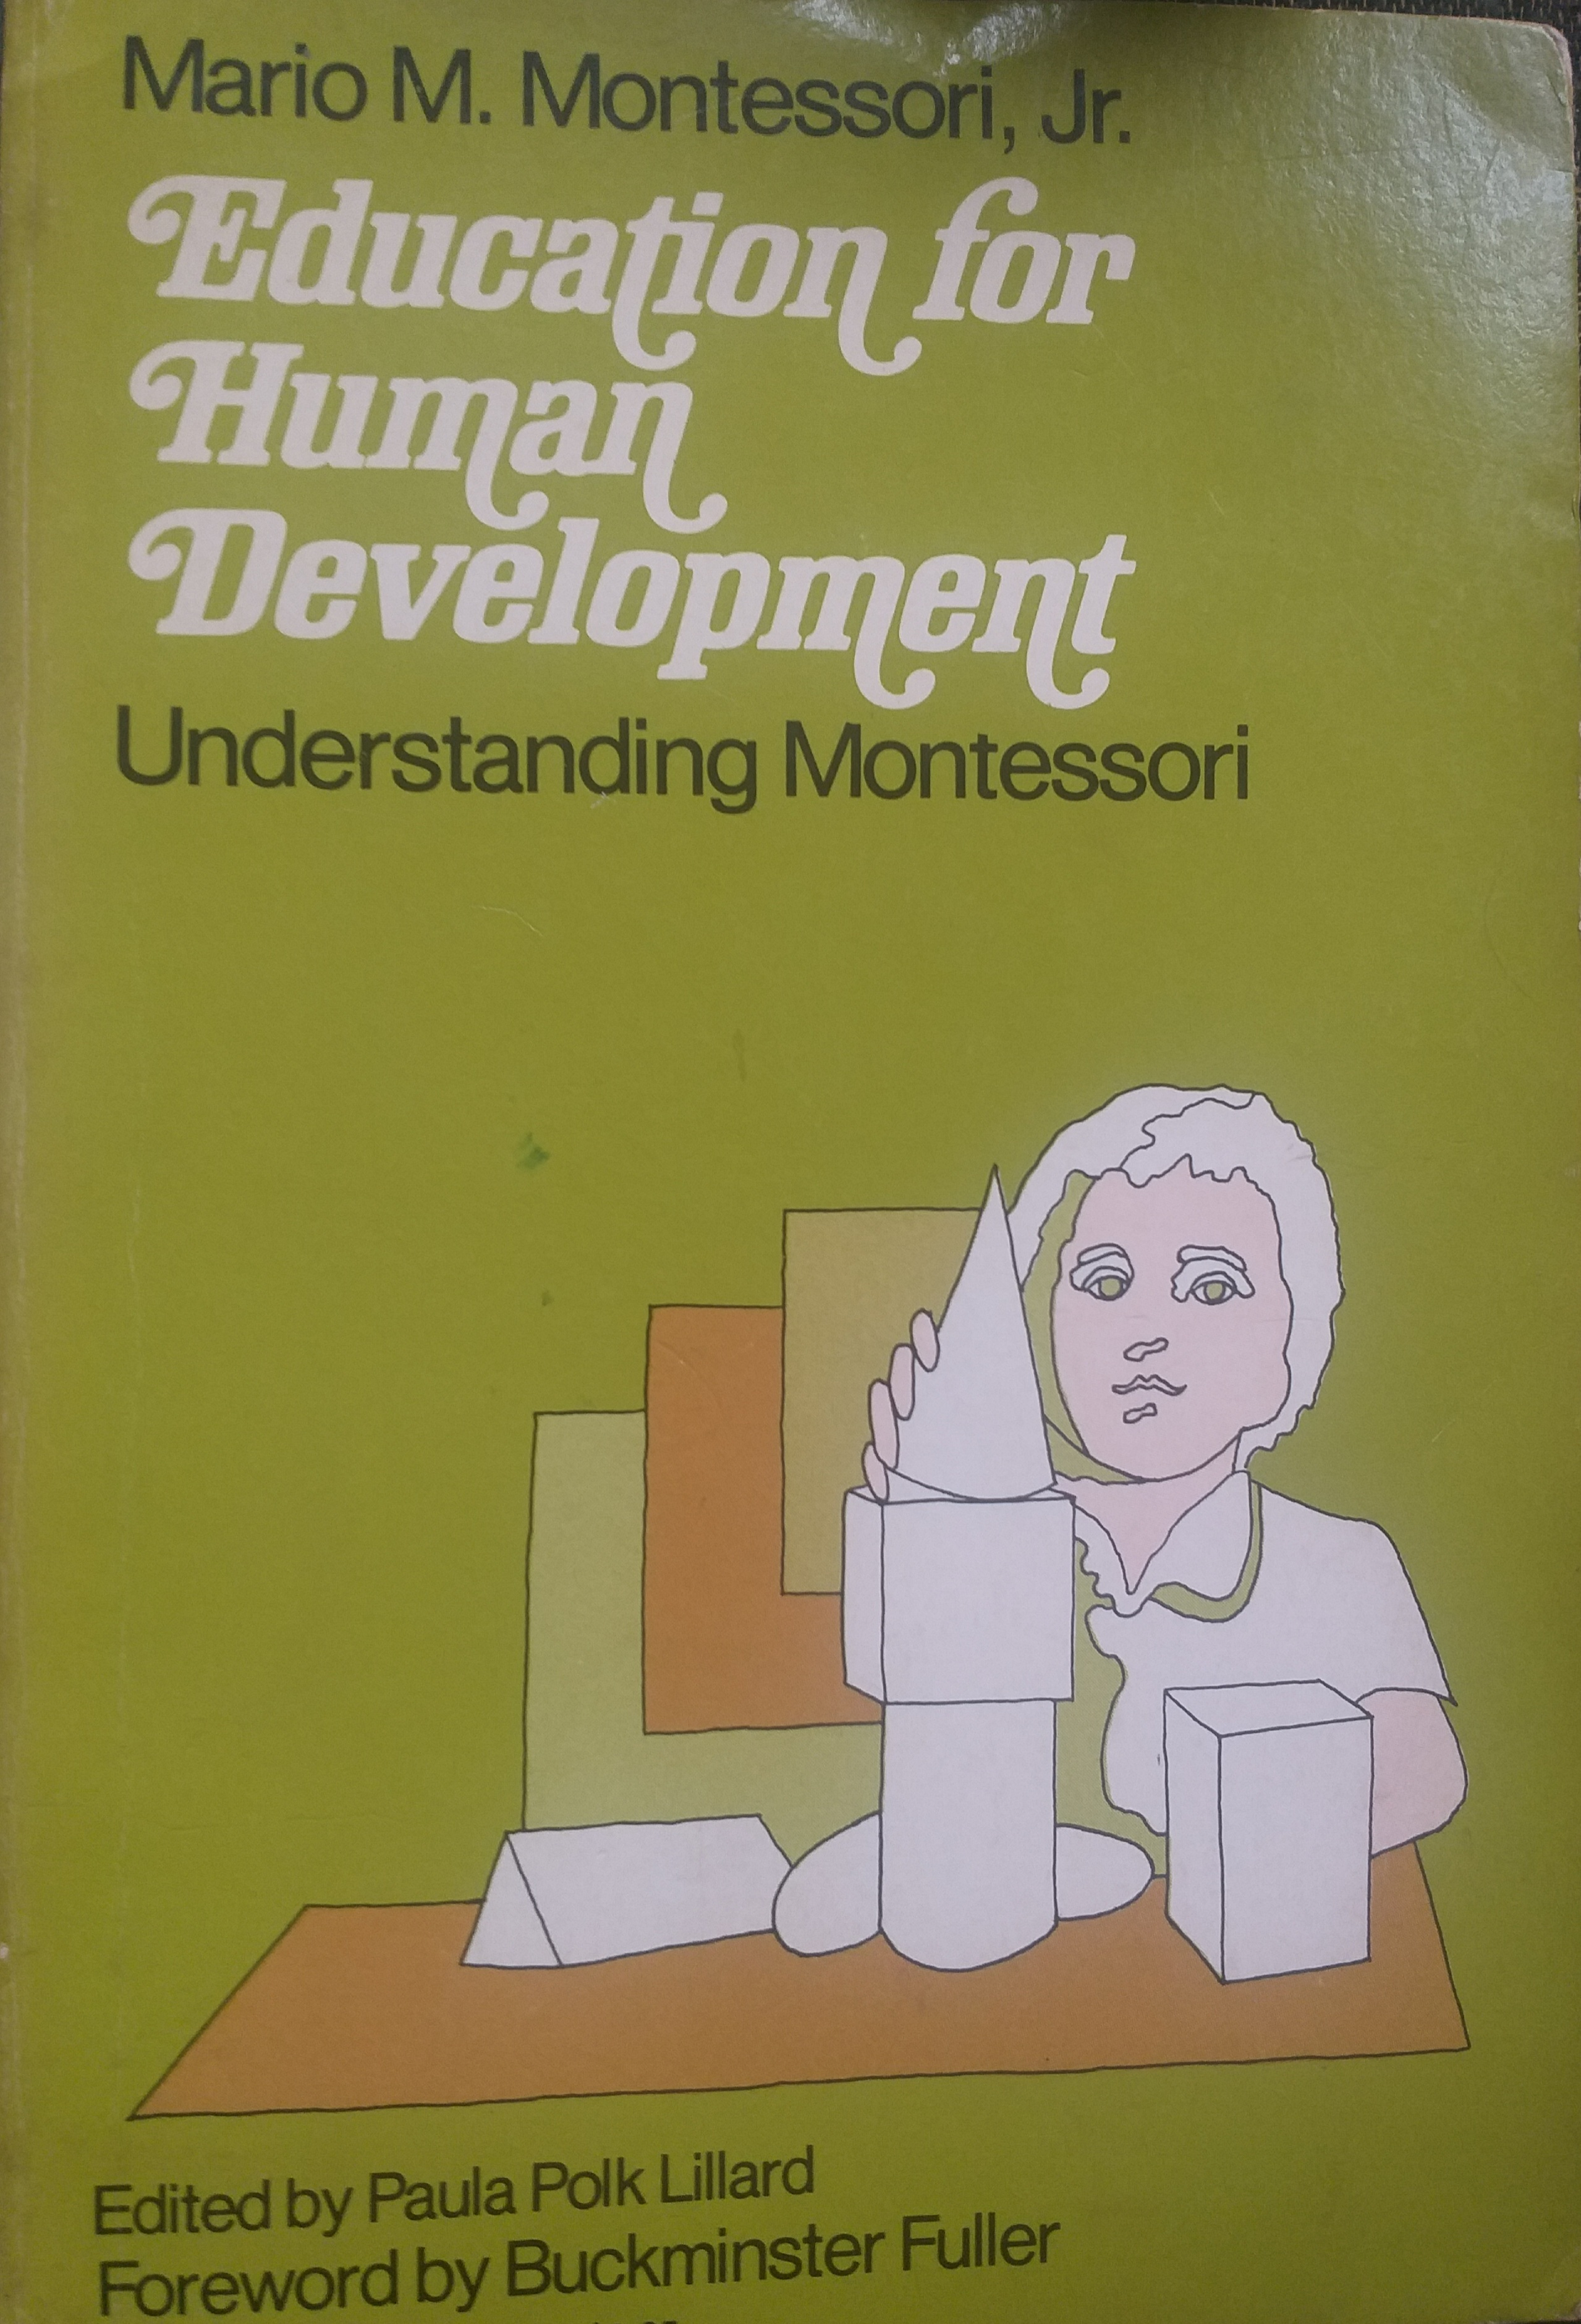 Education for Human Development: Understanding Montessori